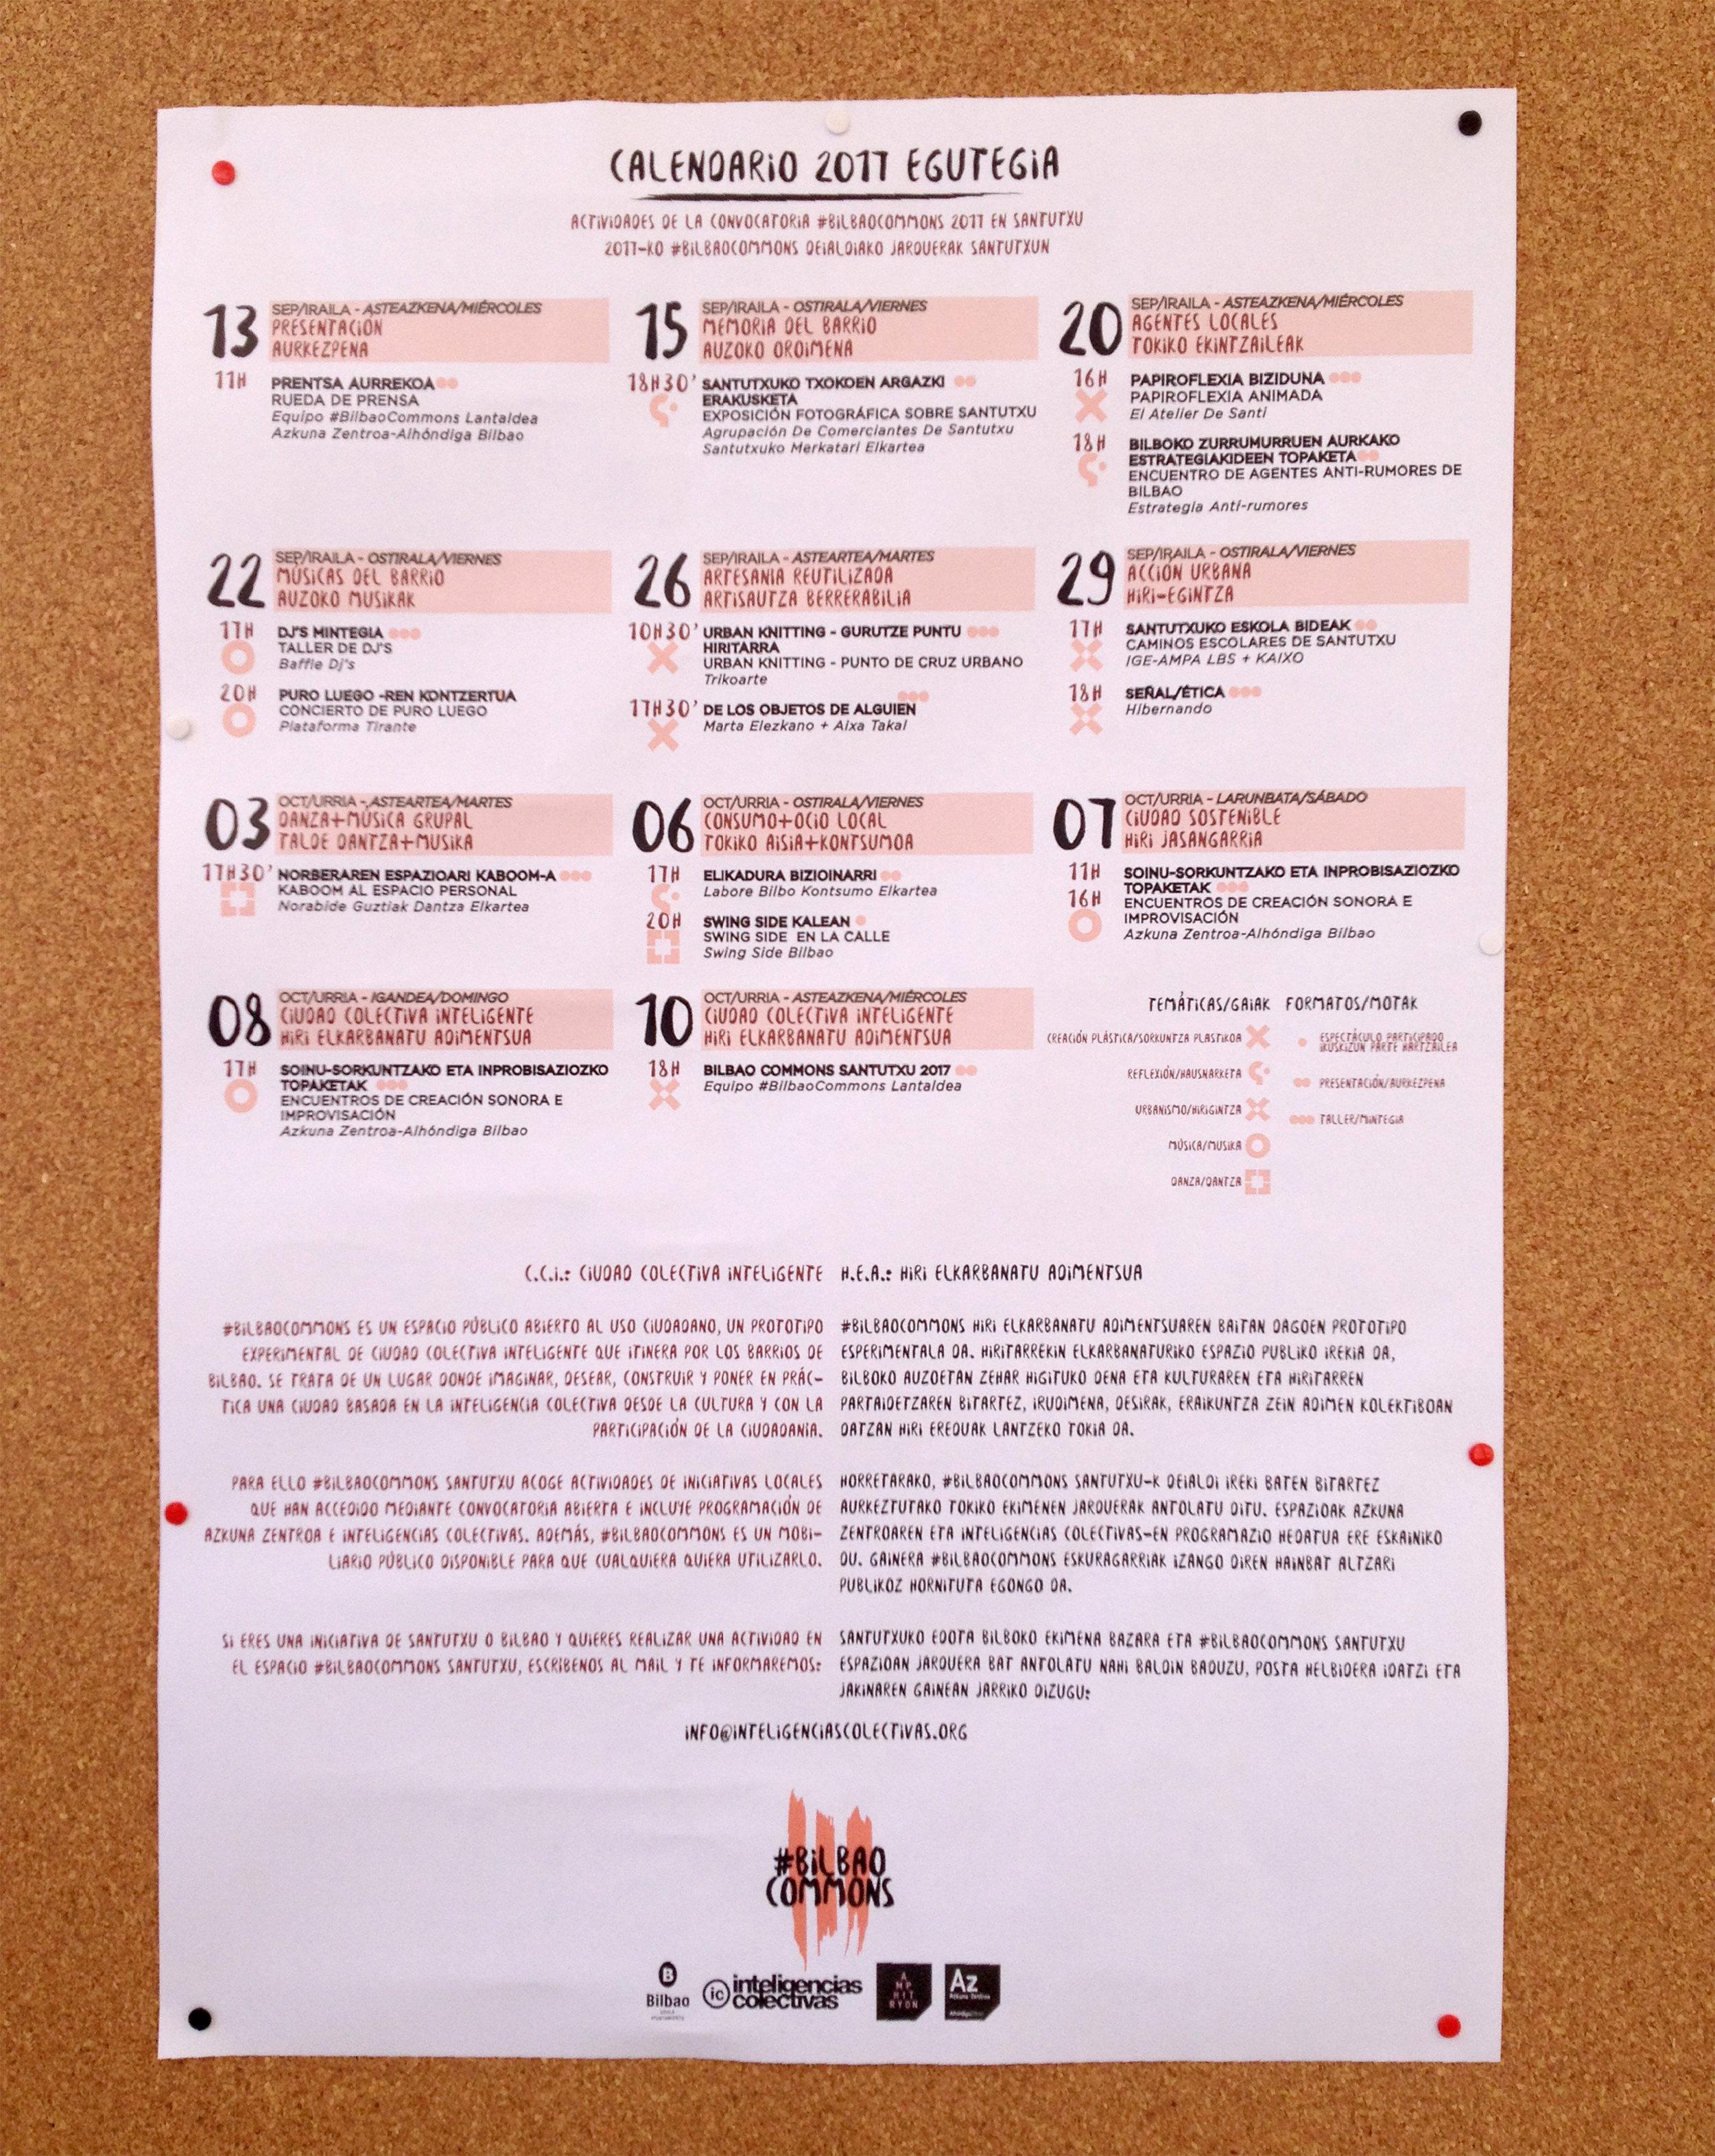 10_trikoarte_BilbaoCommonsSantutxu IMG_7266.jpg